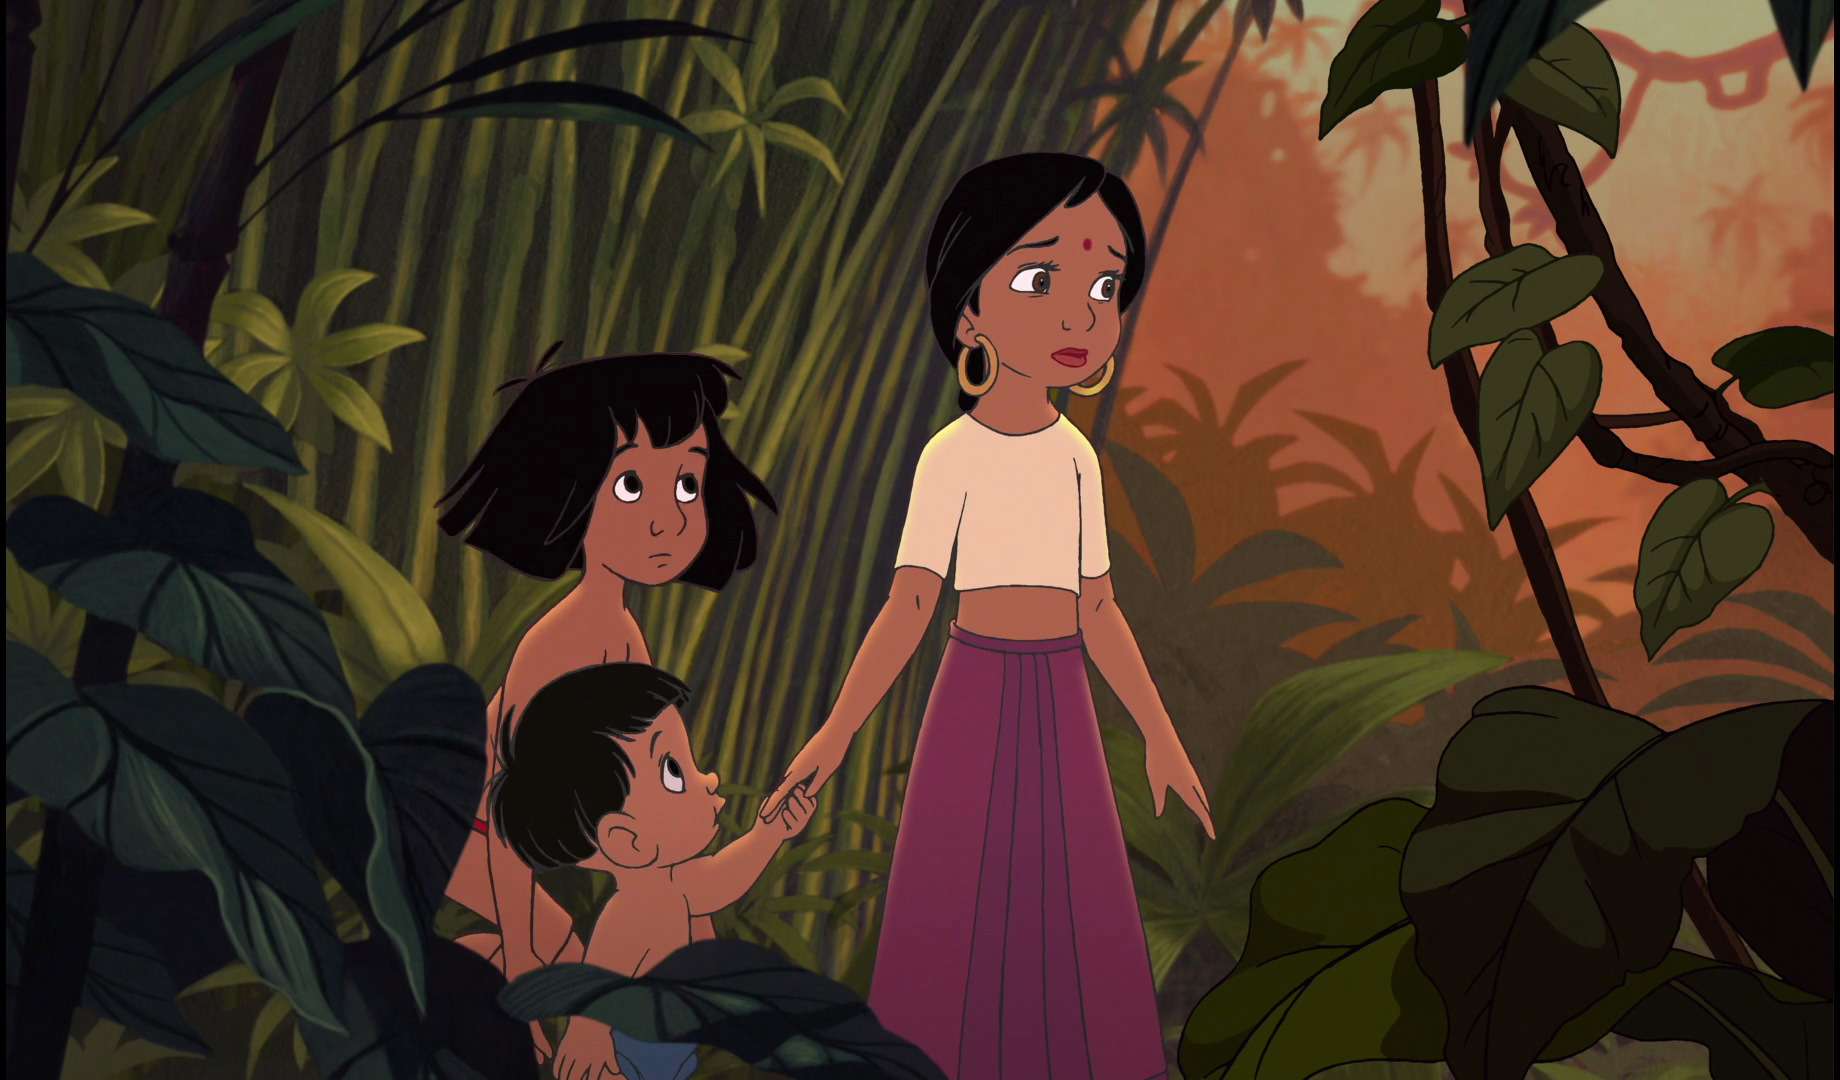 image mowgli shanti and ranjan are safe and soundjpg